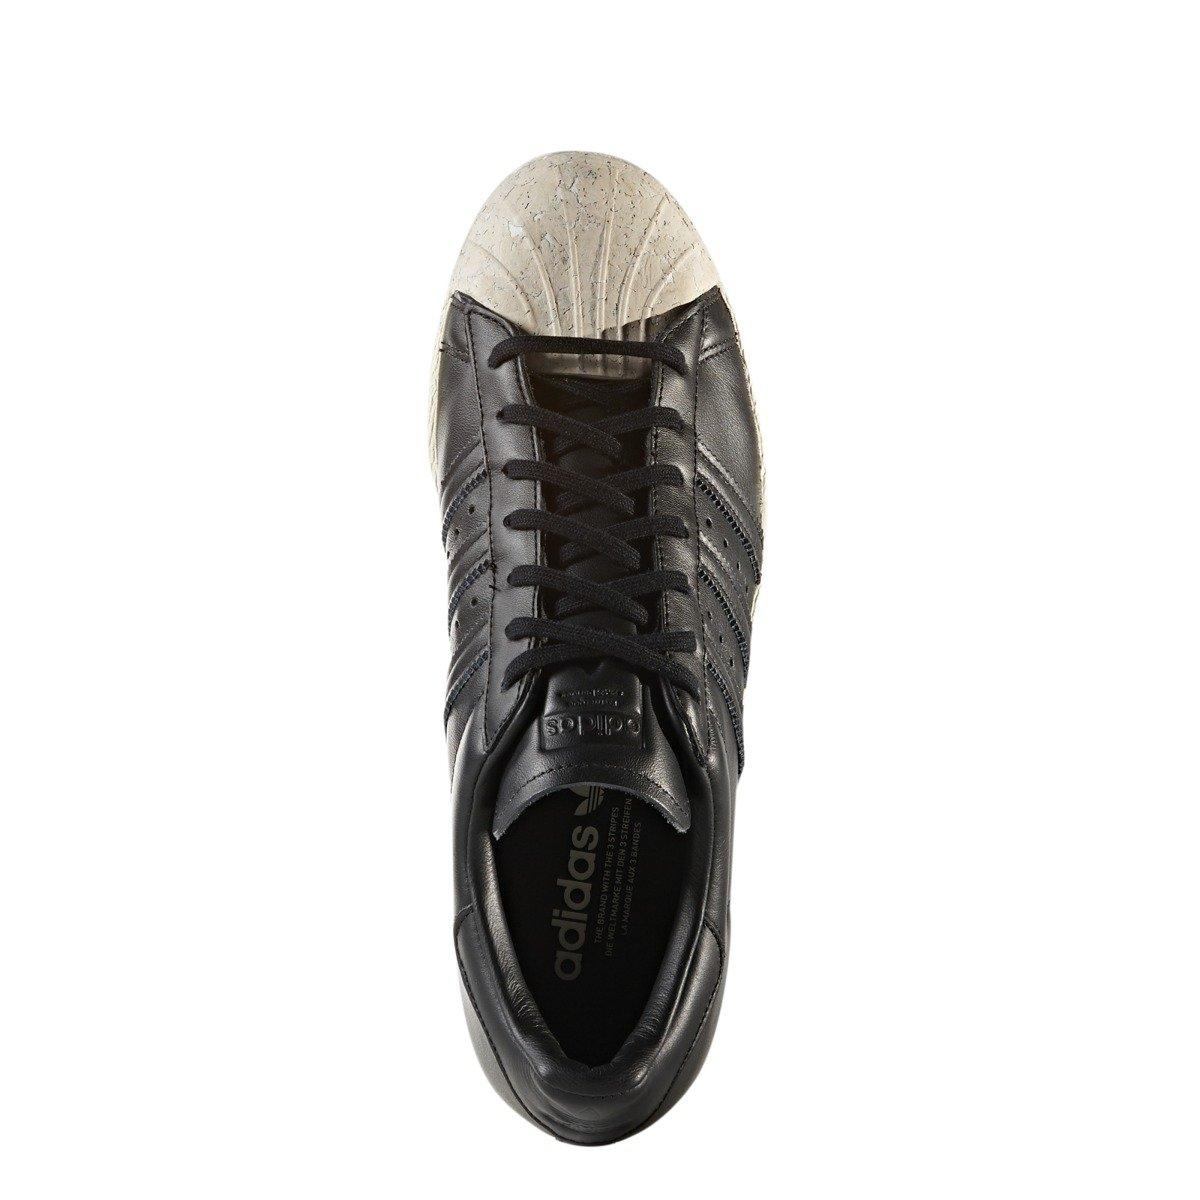 Buty Adidas Originals Superstar 80's Cork BY8707